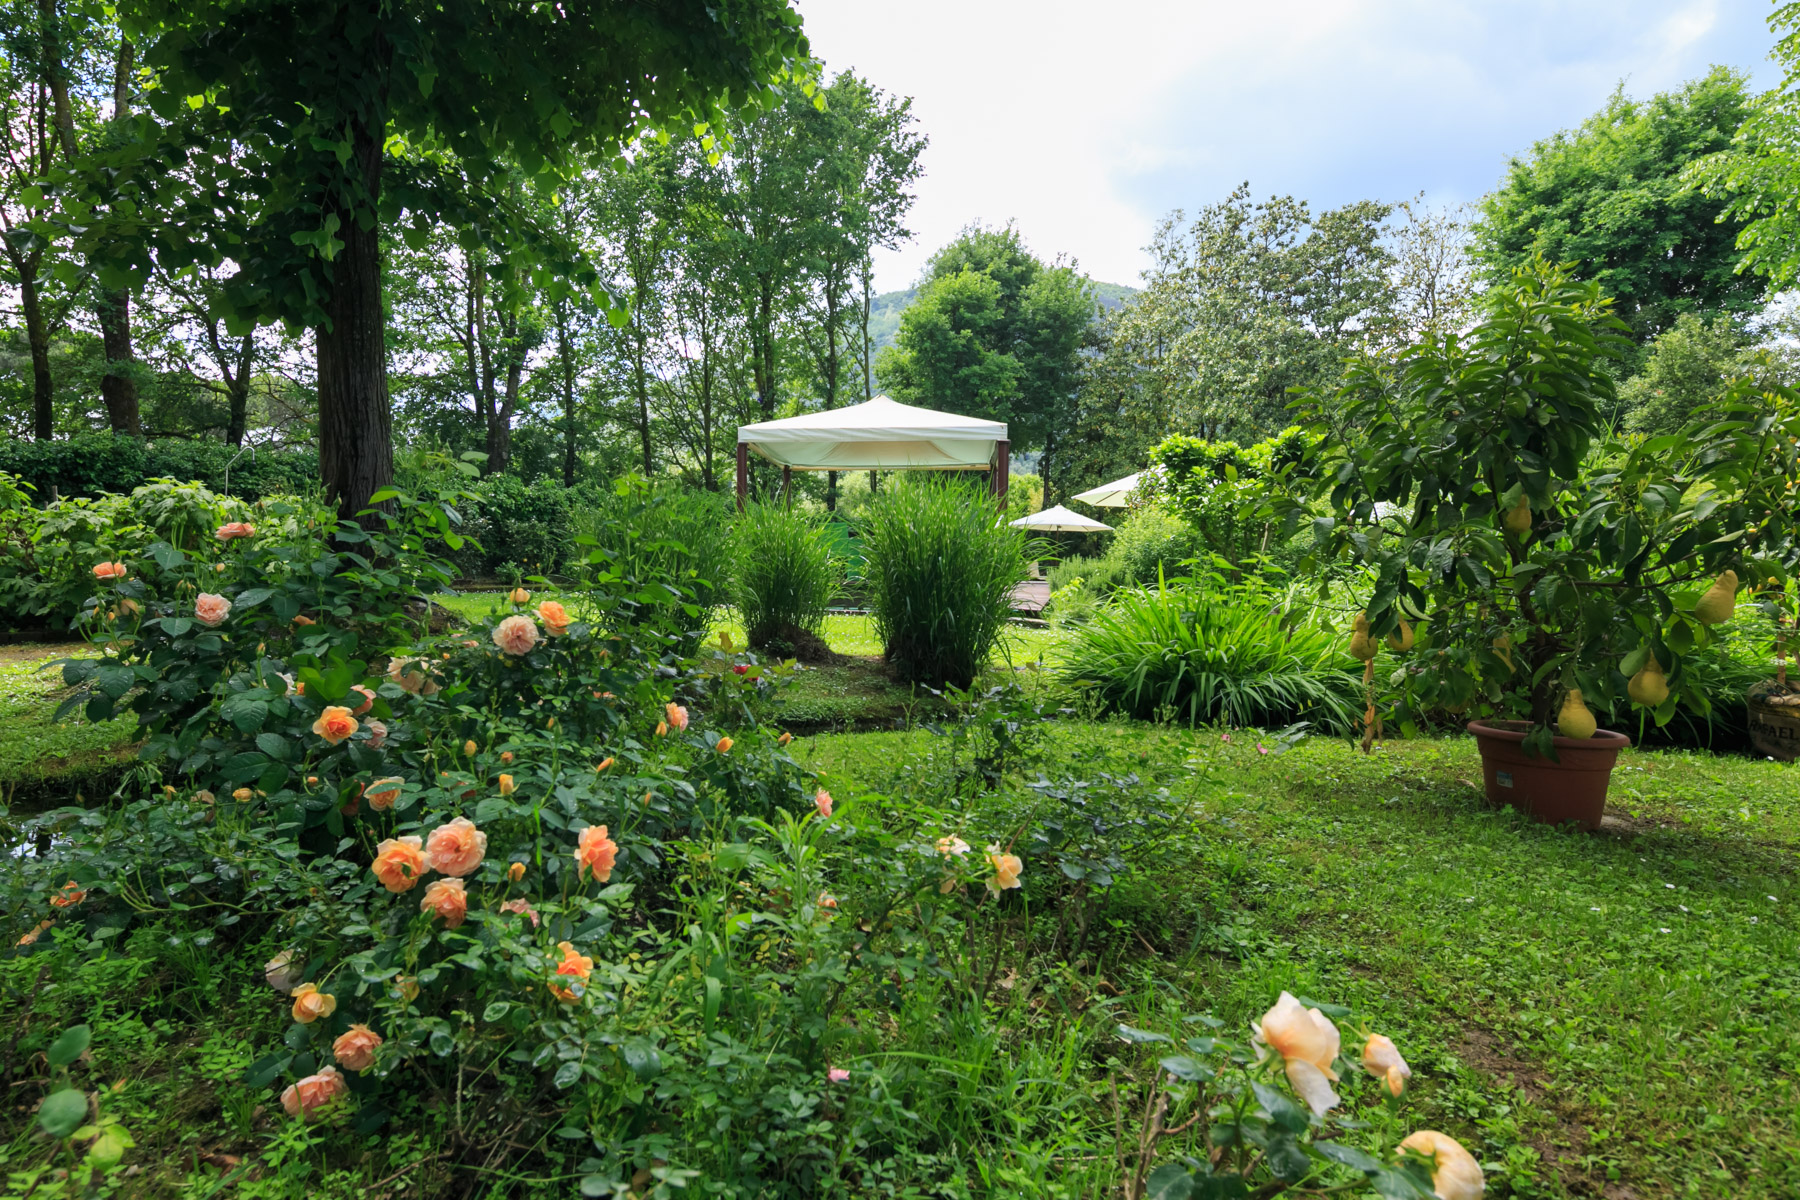 Villa in Vendita a Lucca: 5 locali, 700 mq - Foto 12